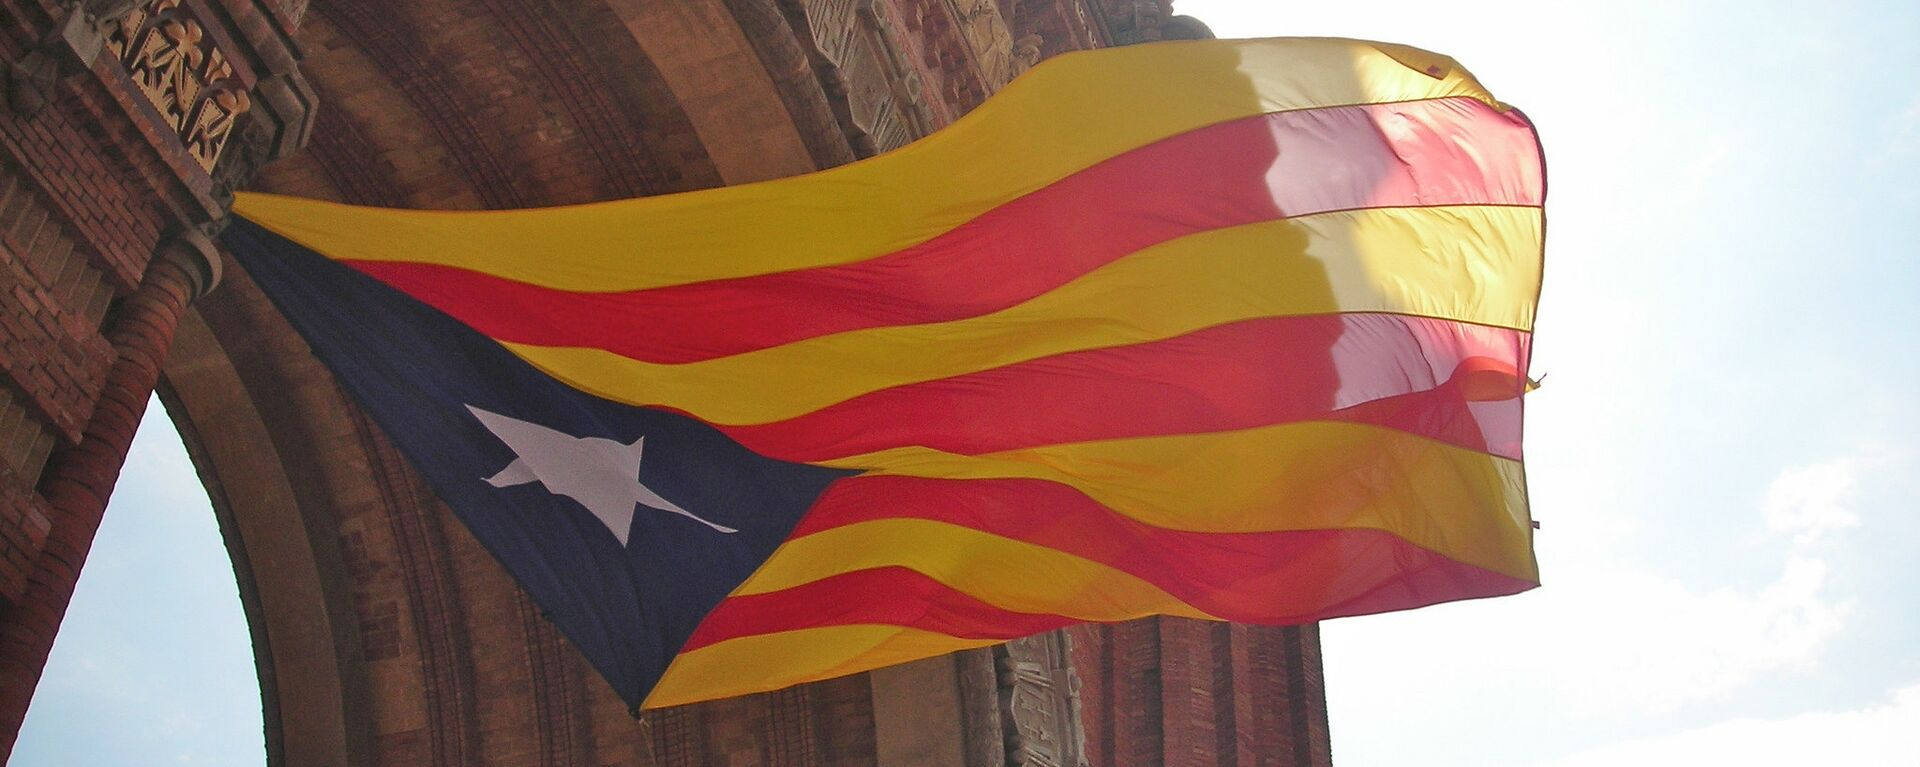 Estelada, la bandera independentista de Cataluña - Sputnik Mundo, 1920, 10.05.2021